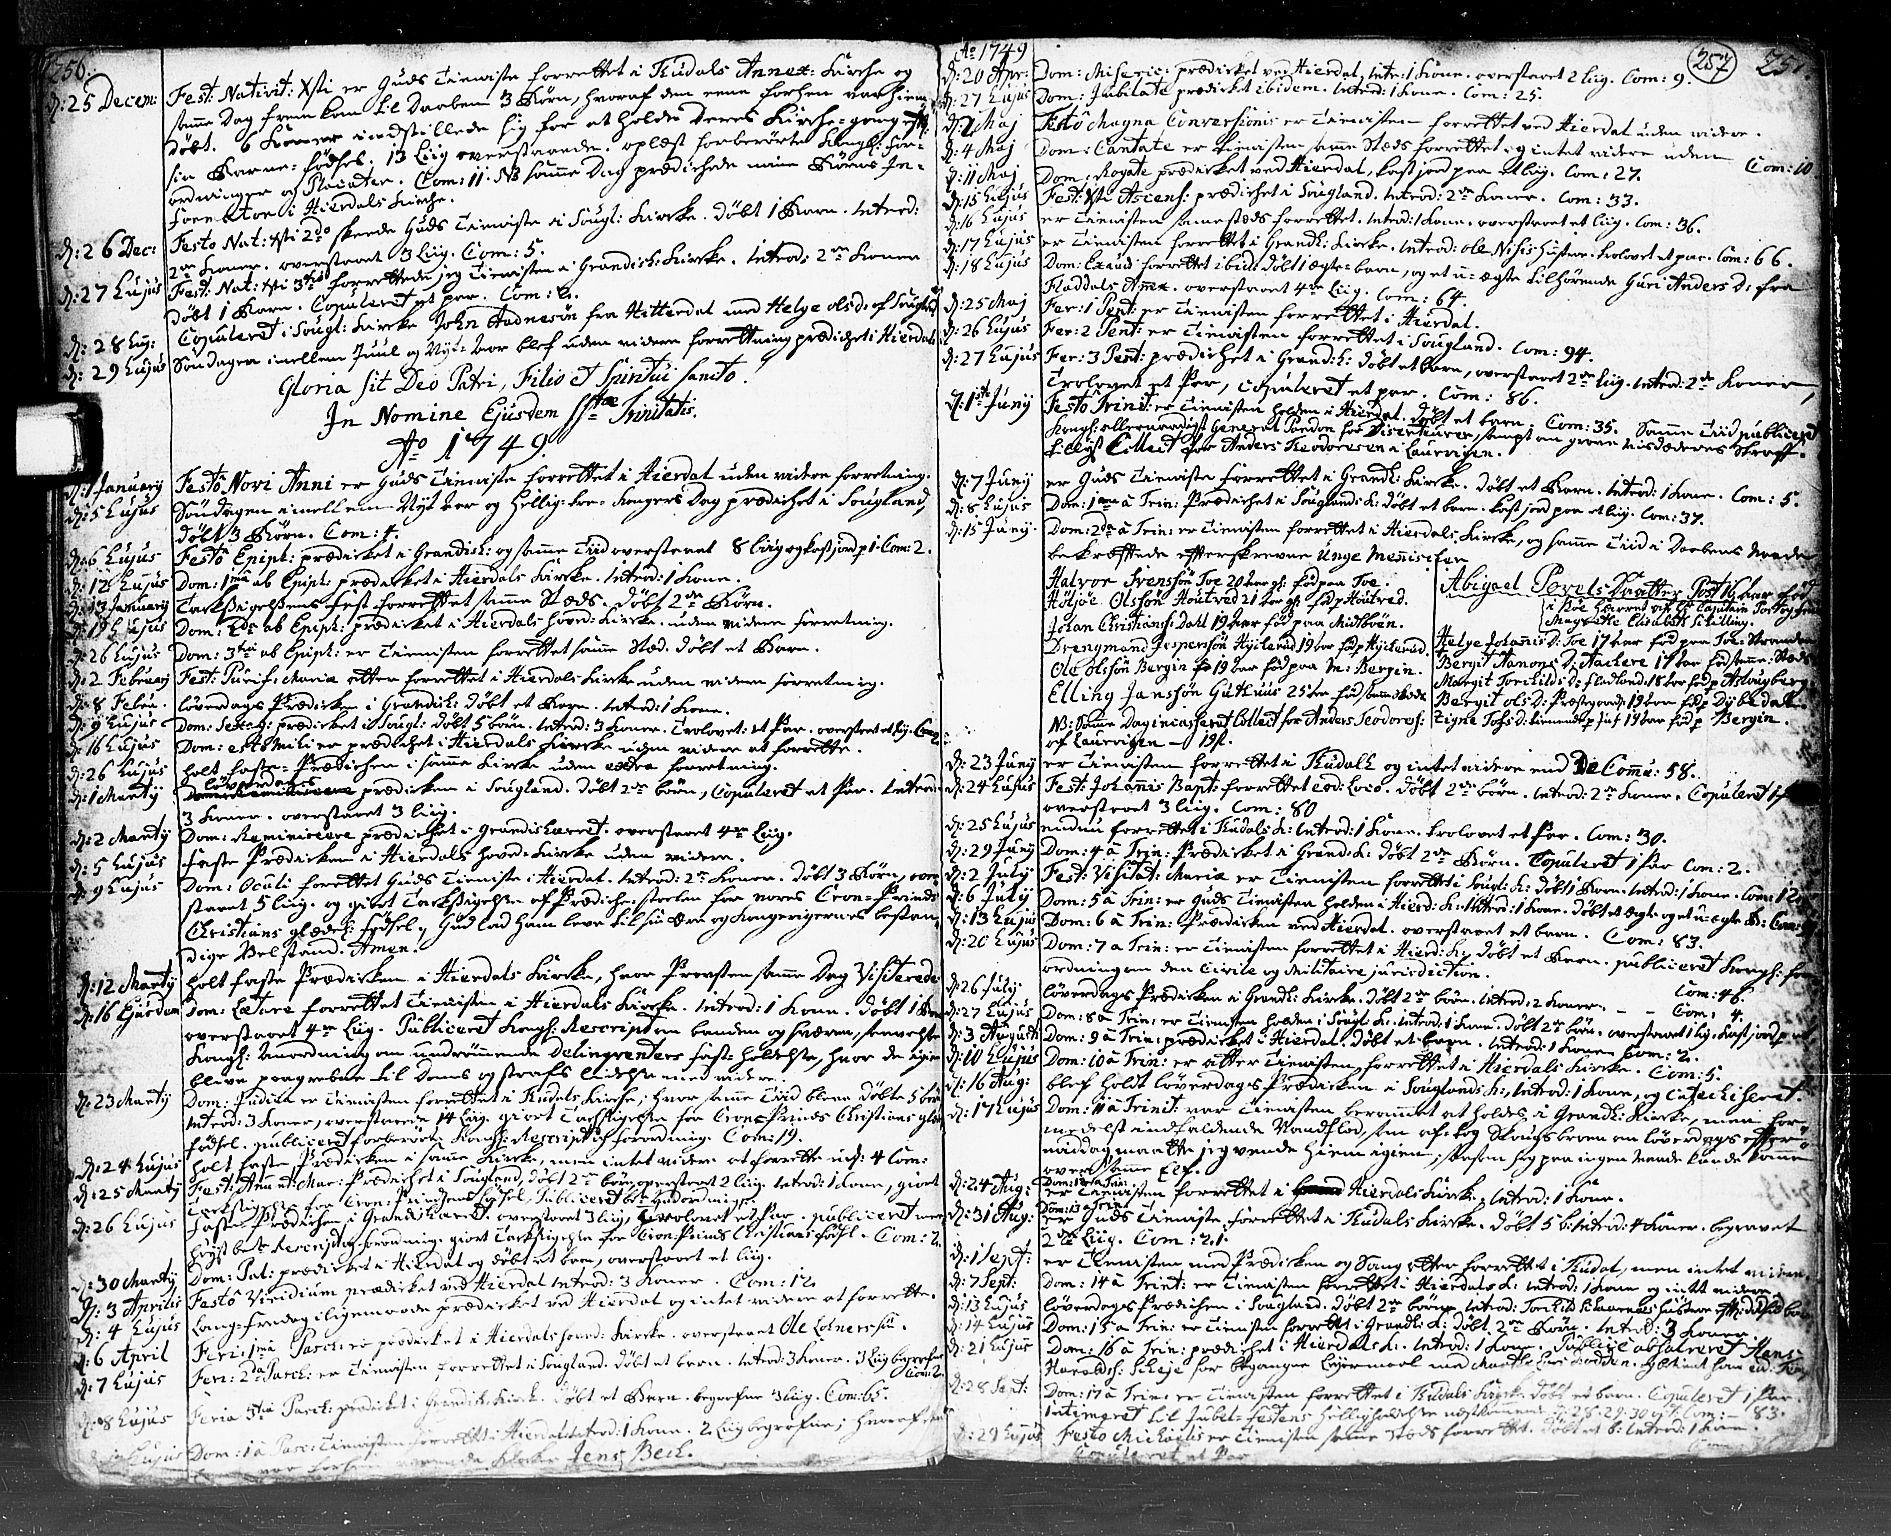 SAKO, Hjartdal kirkebøker, F/Fa/L0002: Ministerialbok nr. I 2, 1716-1754, s. 256-257